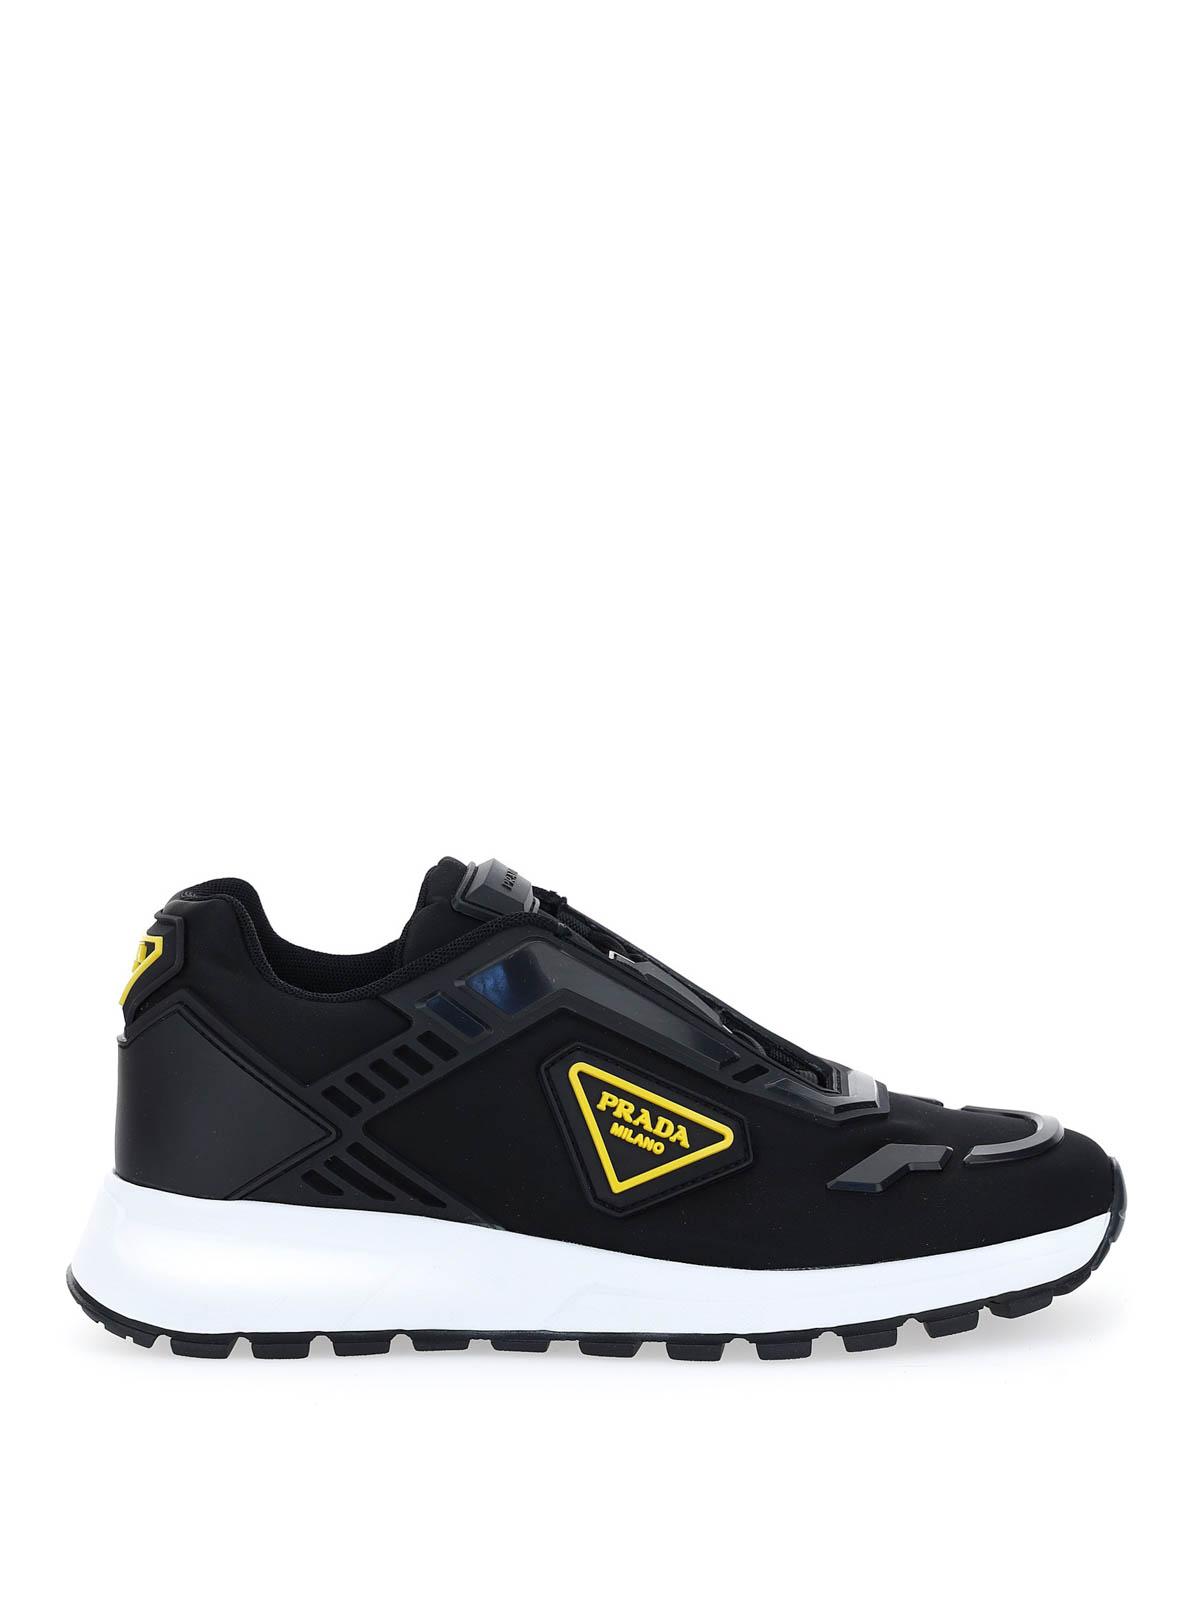 Prada - Neon logo sneakers - trainers